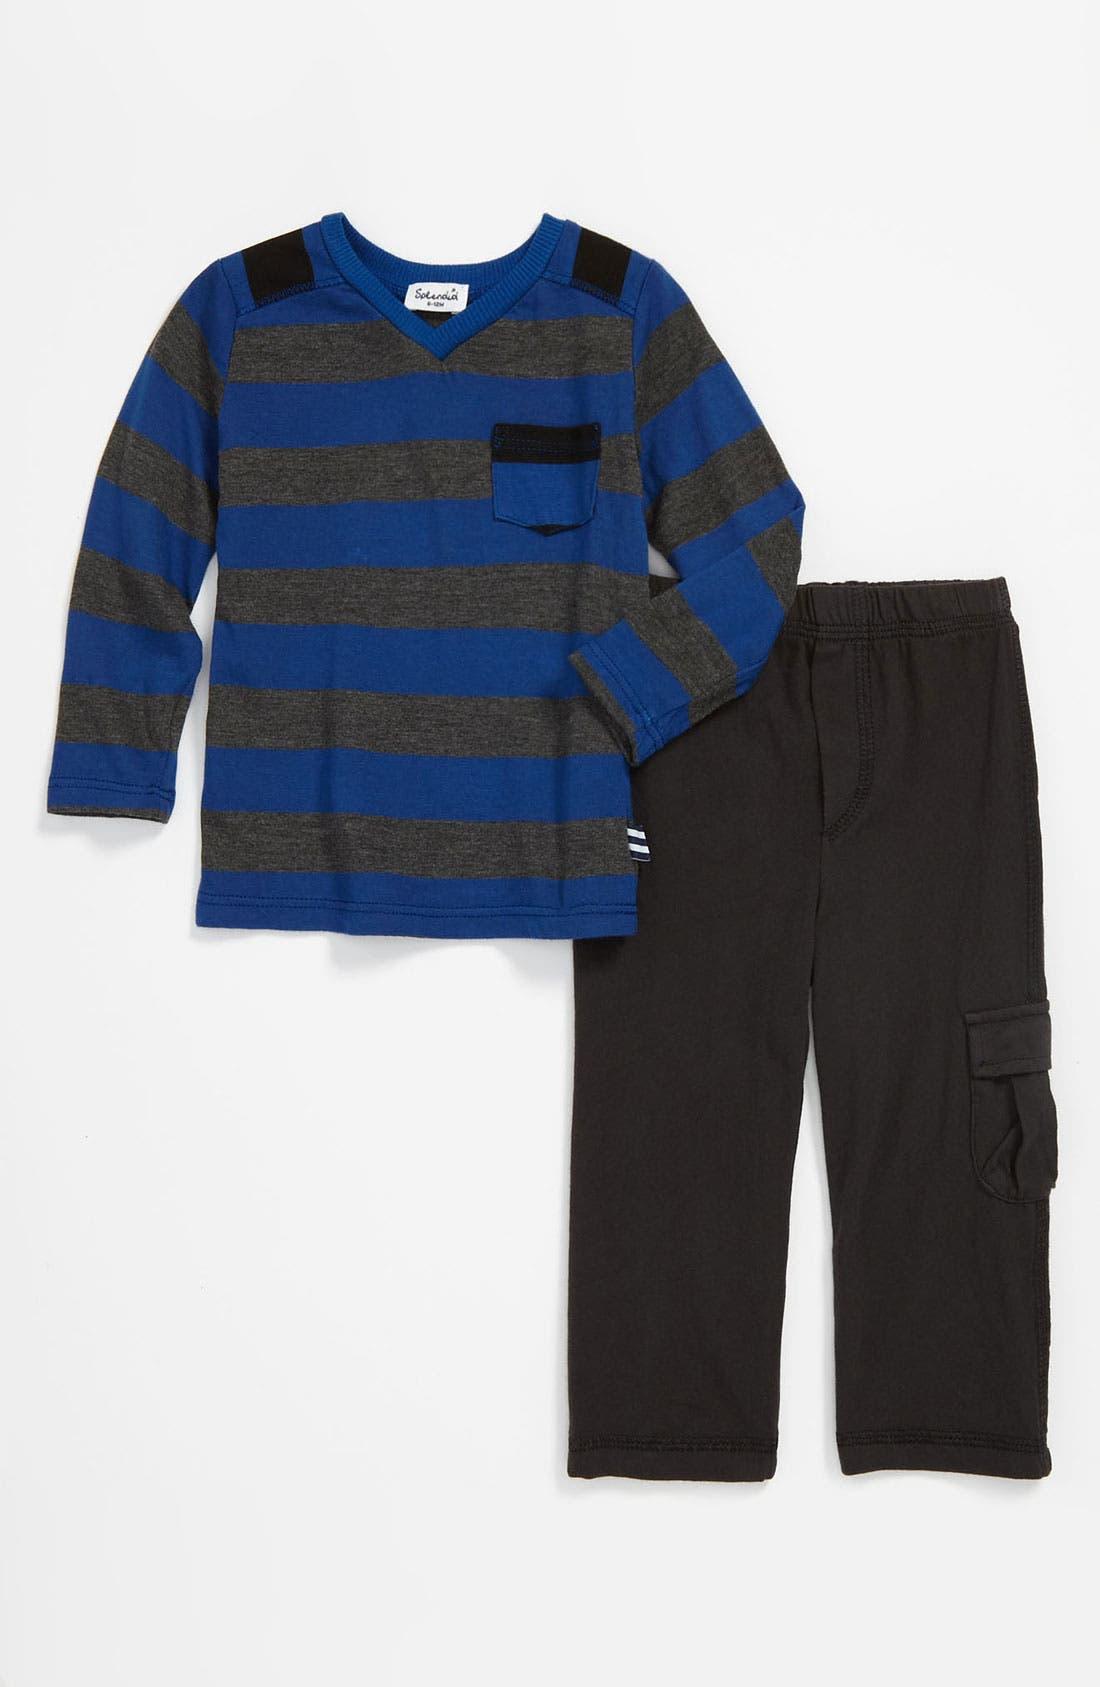 Main Image - Splendid Stripe Top & Knit Pants (Infant)